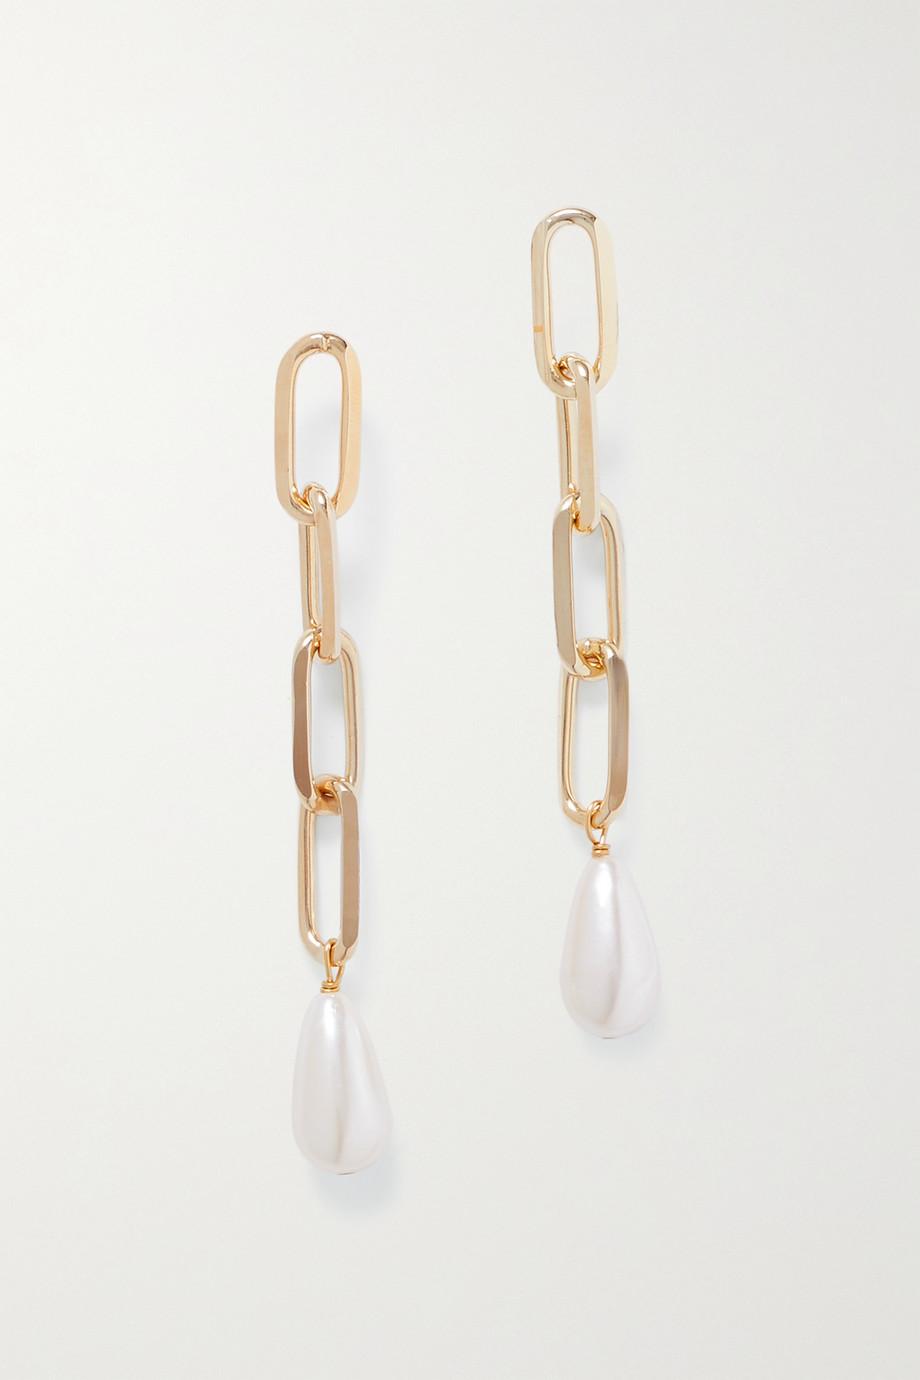 Rosantica Promessa goldfarbene Ohrringe mit Kunstperlen